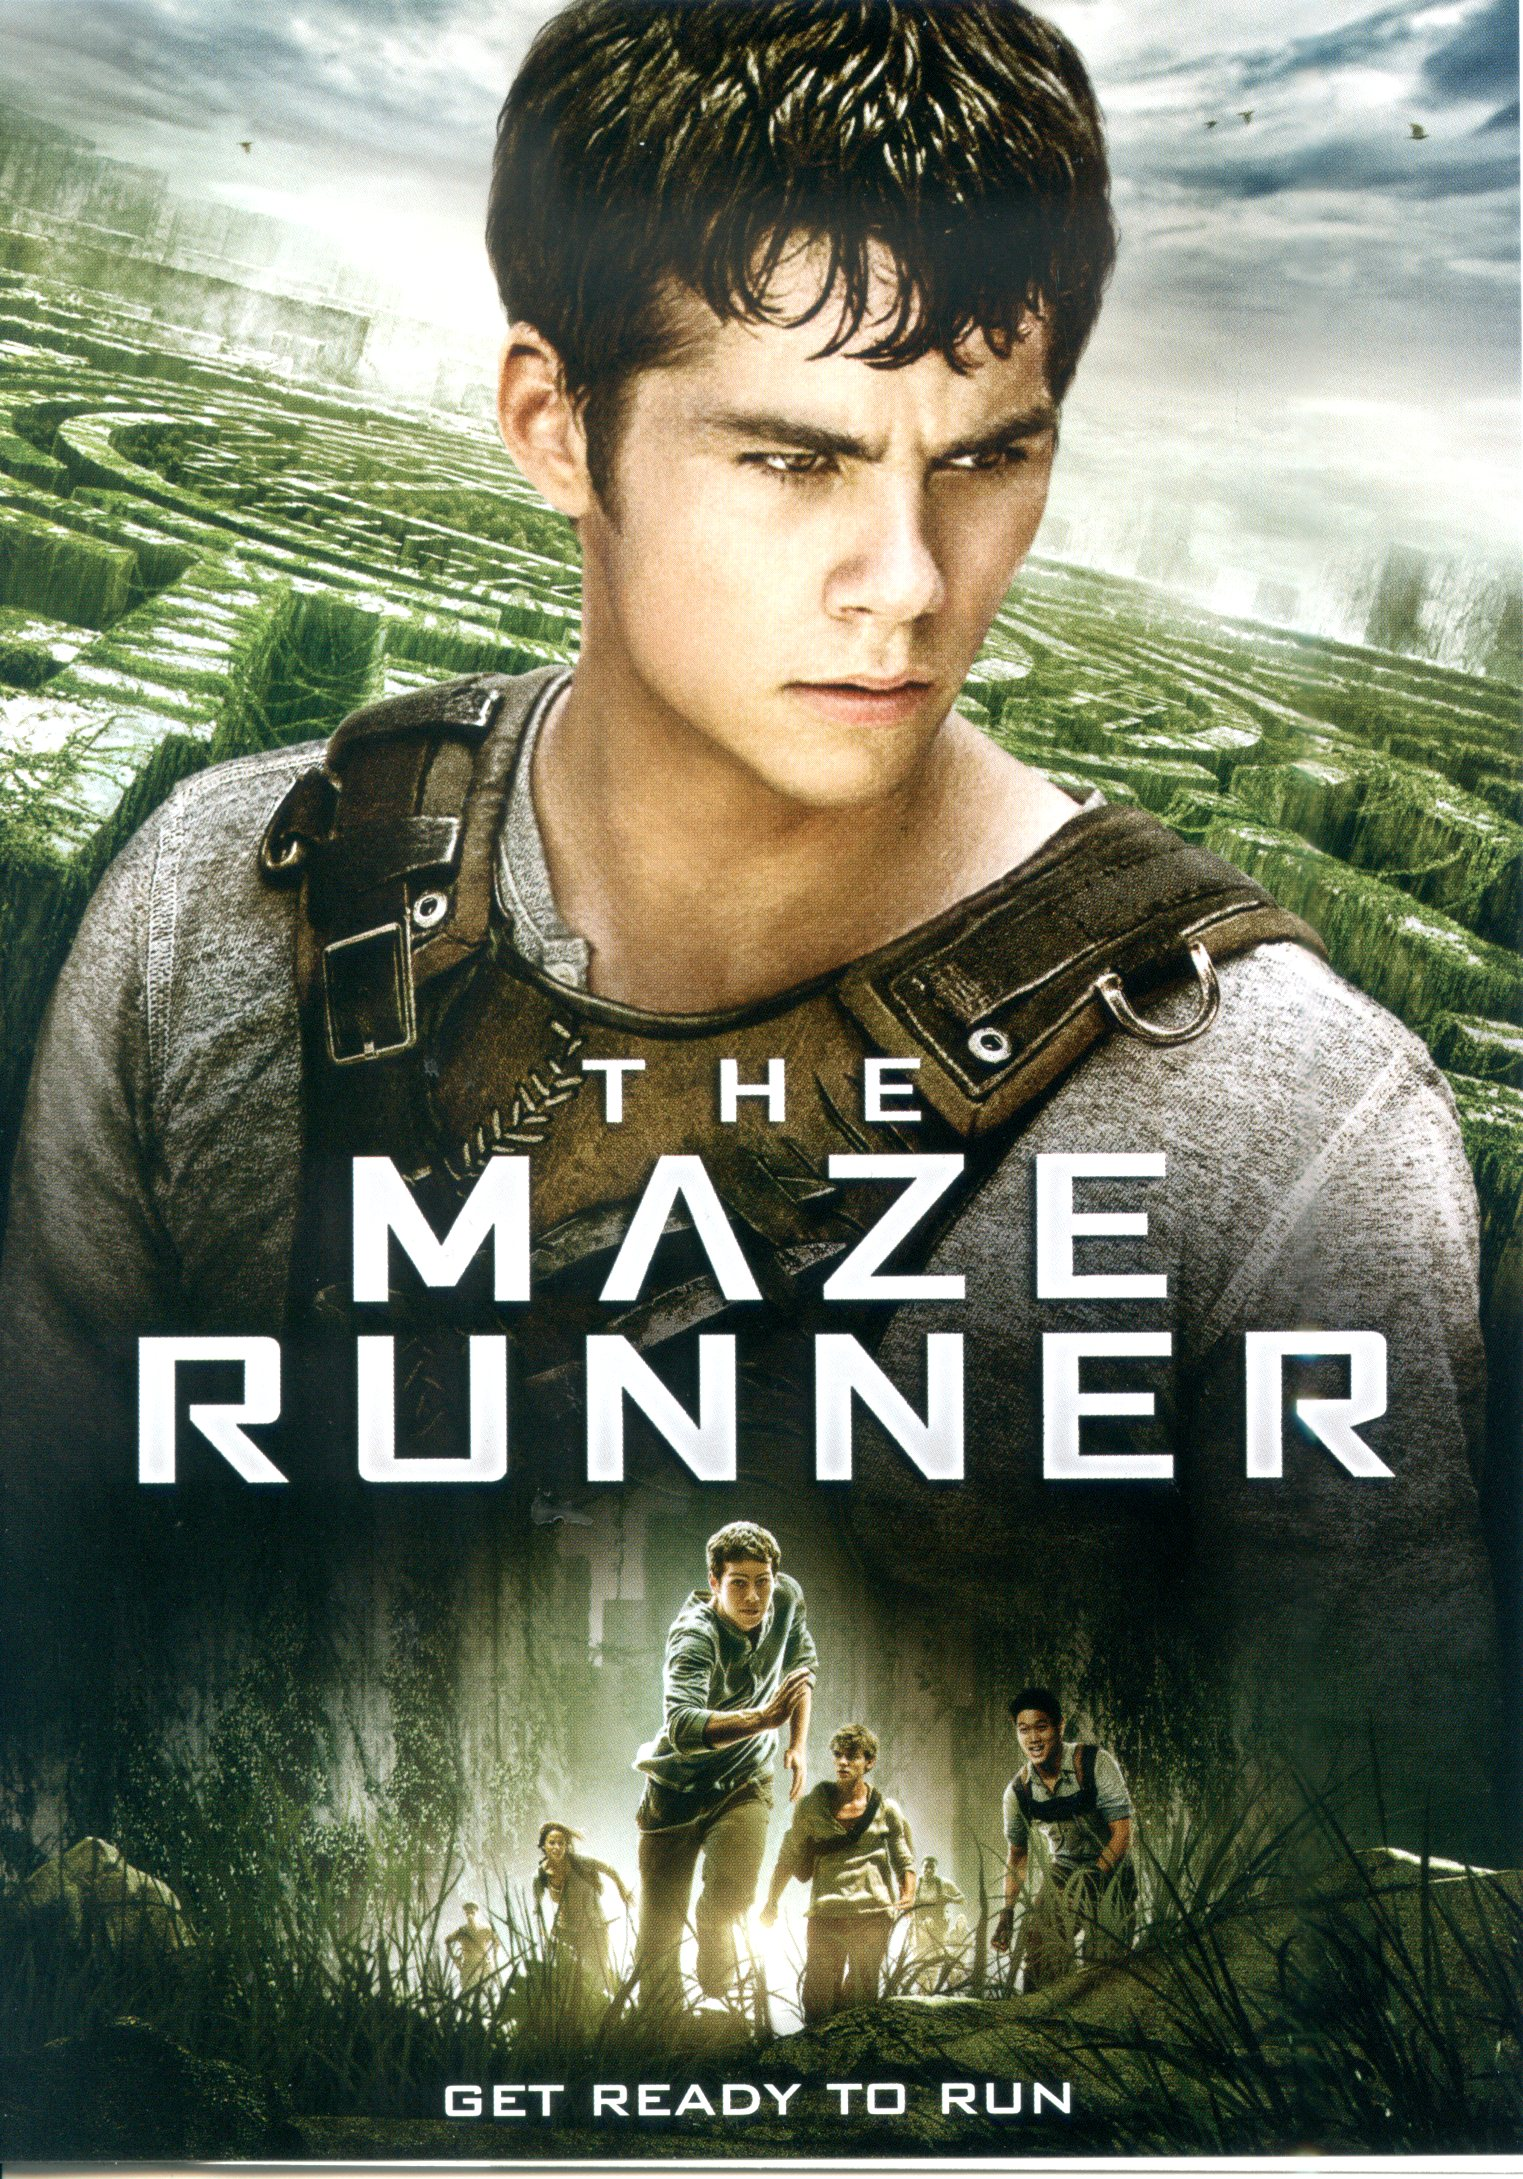 The maze runner(家用版) 移動迷宮 /